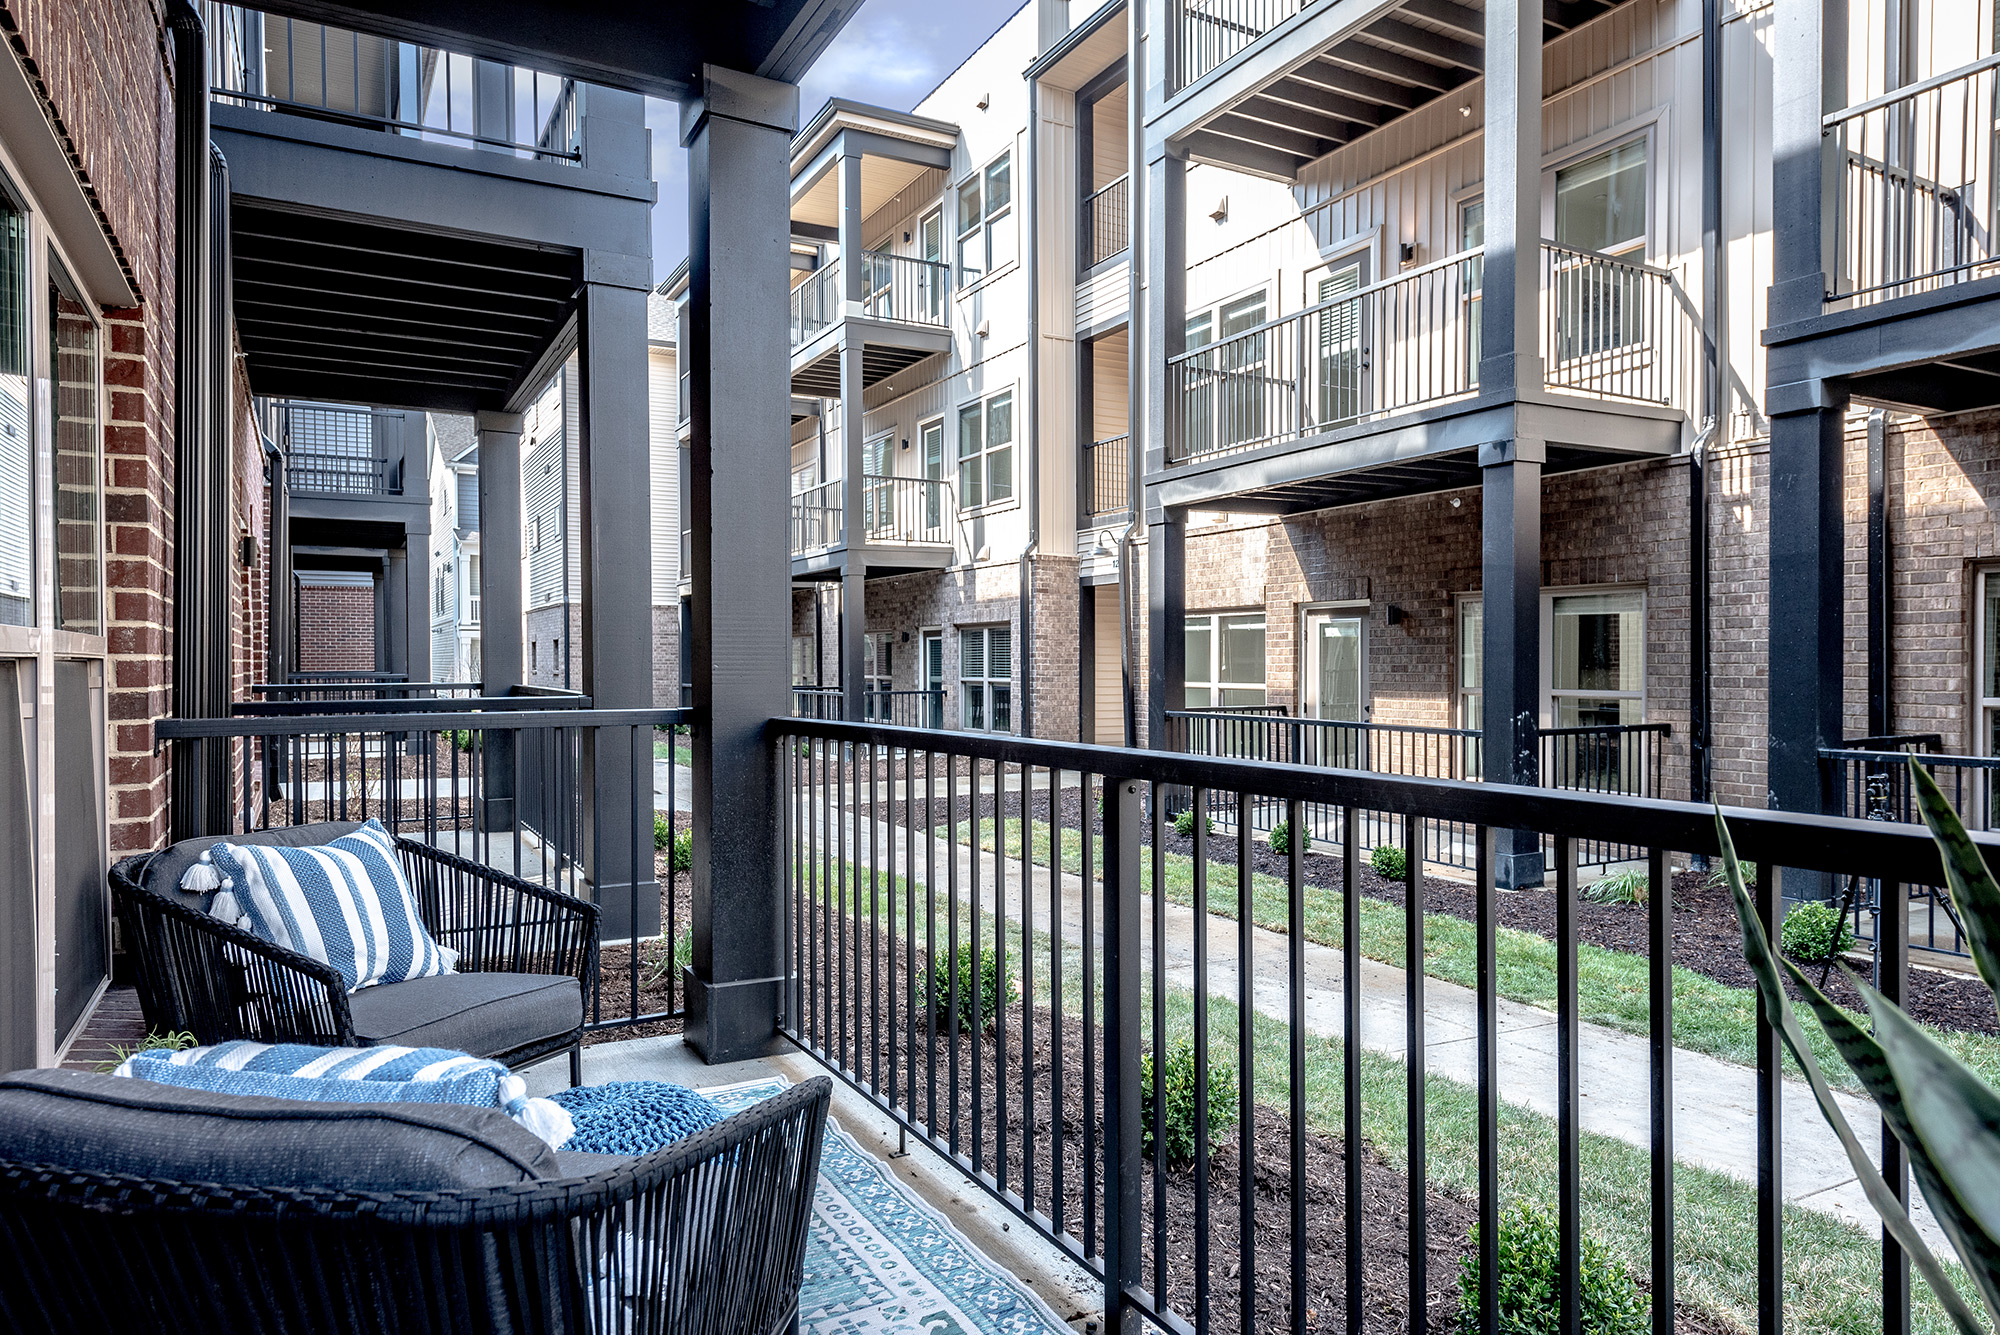 Balcony of Grant Park Apartments